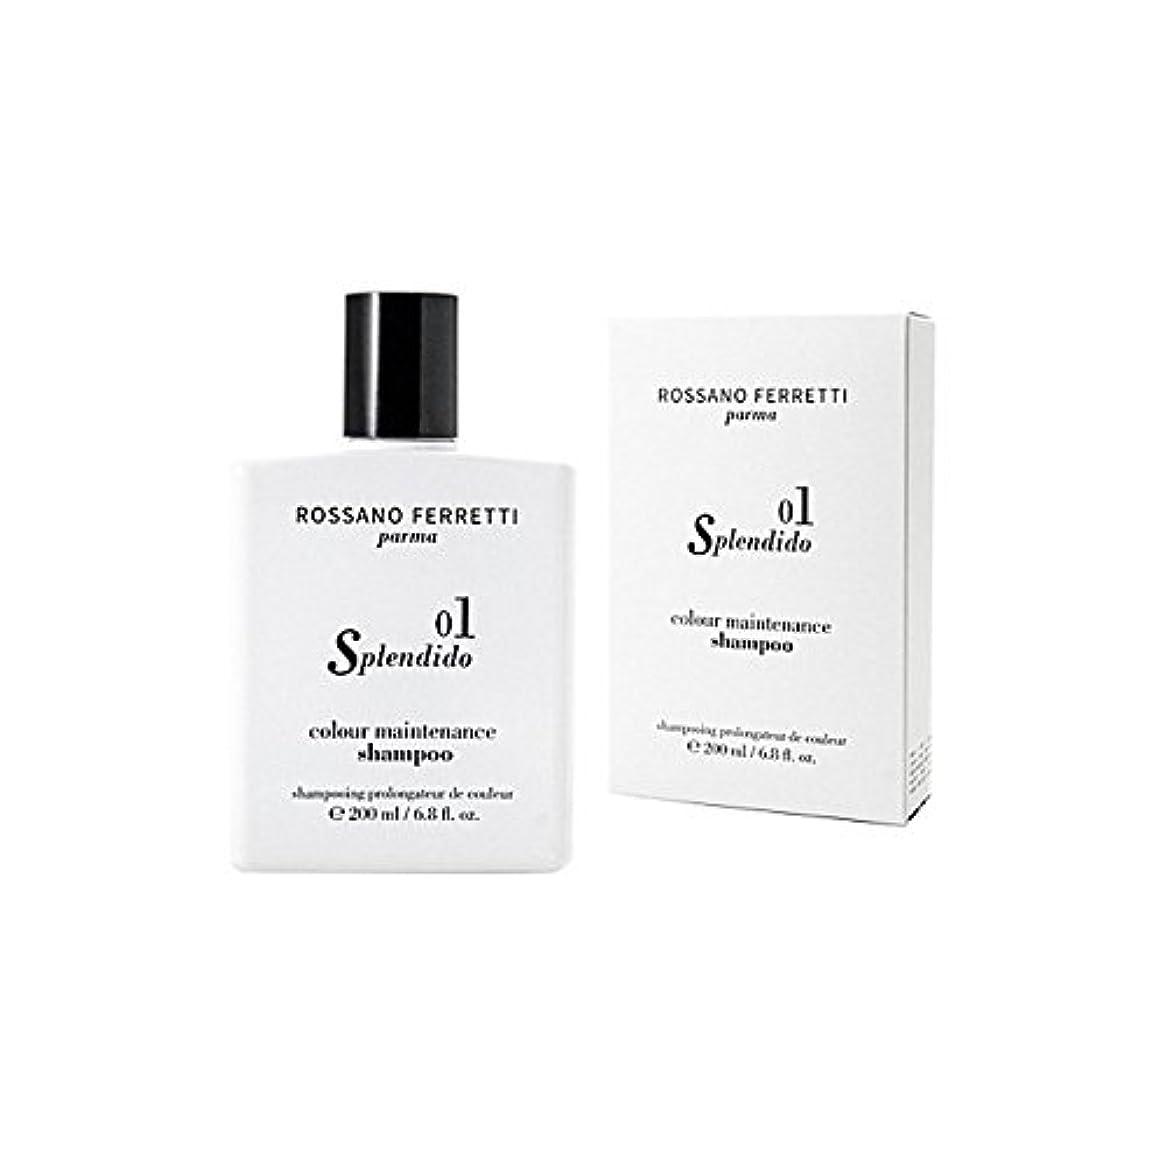 Rossano Ferretti Parma Splendido Colour Maintenance Shampoo 200ml (Pack of 6) - ロッサノフェレッティパルマスプレンディードカラーメンテナンスシャンプー200ミリリットル x6 [並行輸入品]